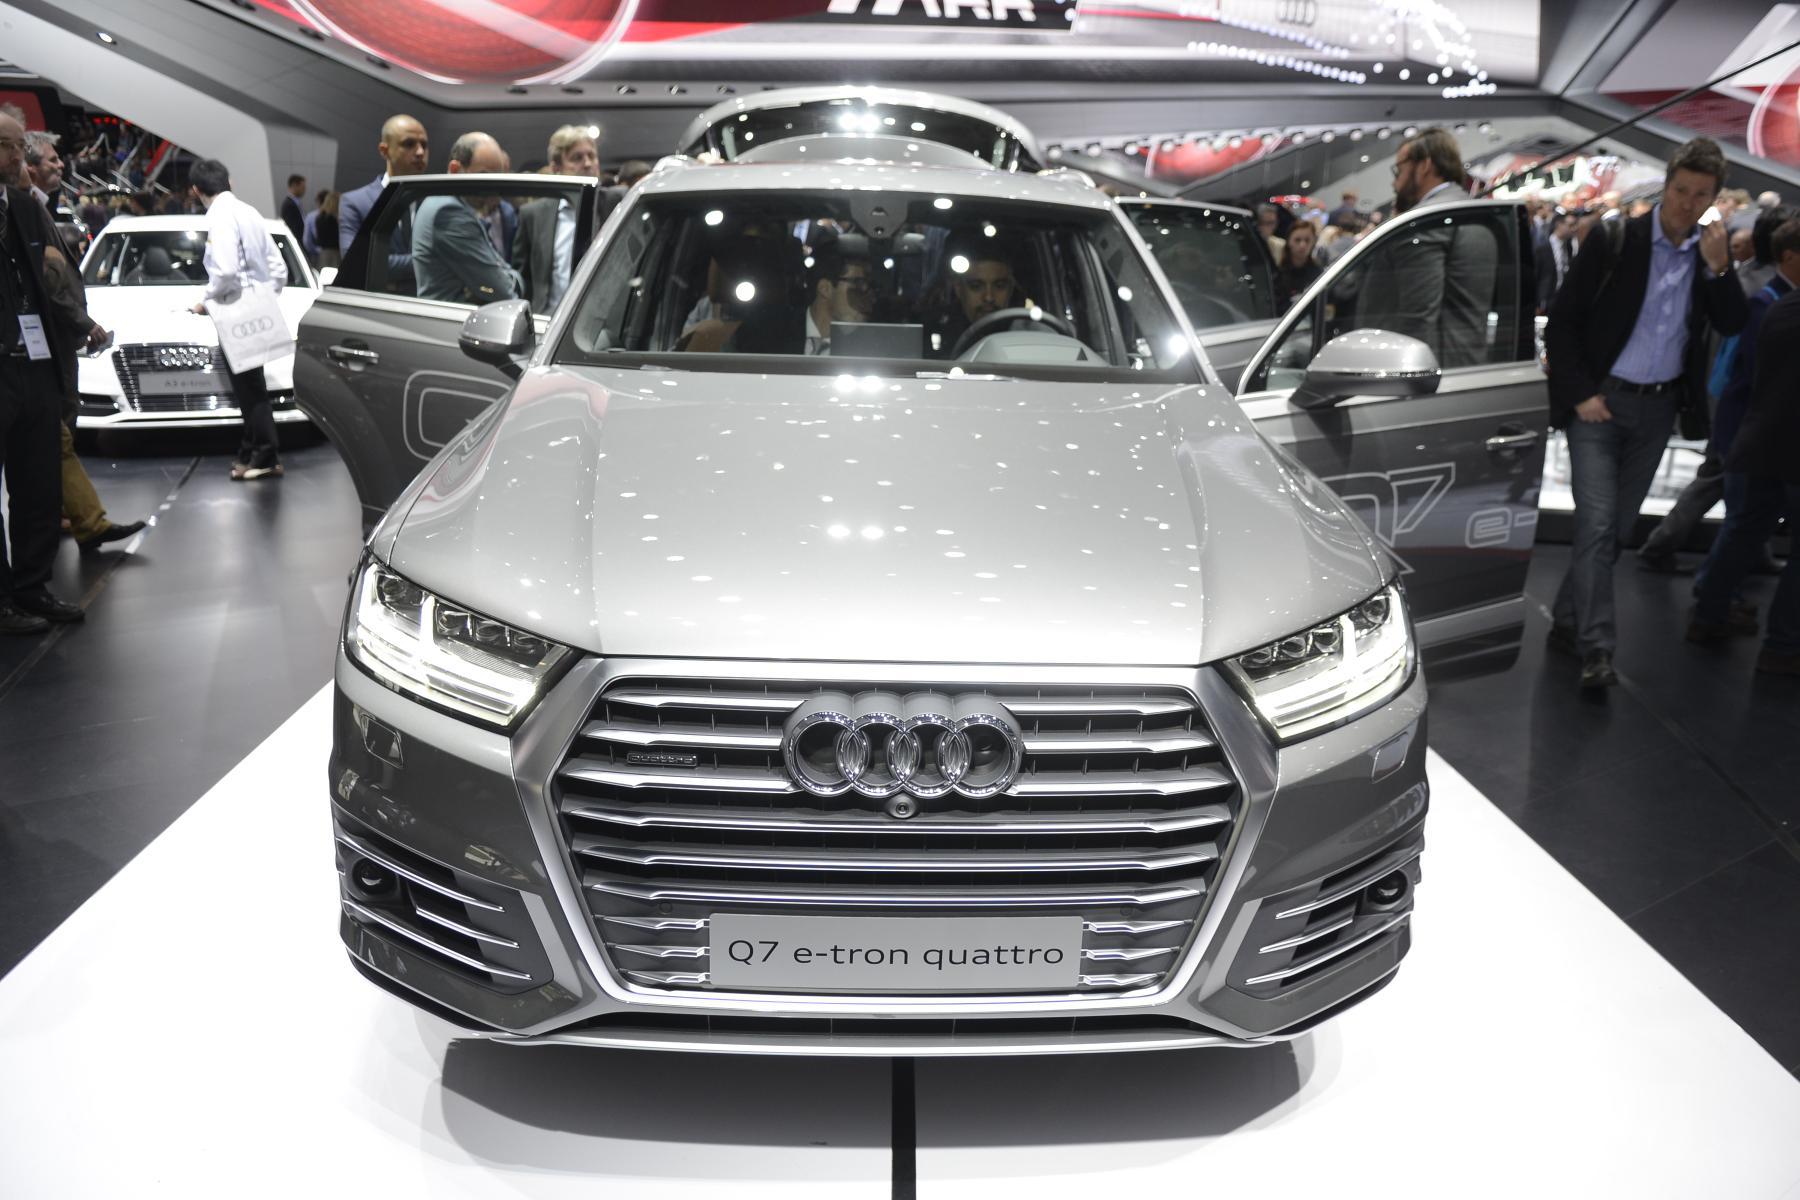 Audi Q7 e-tron quattro (front)